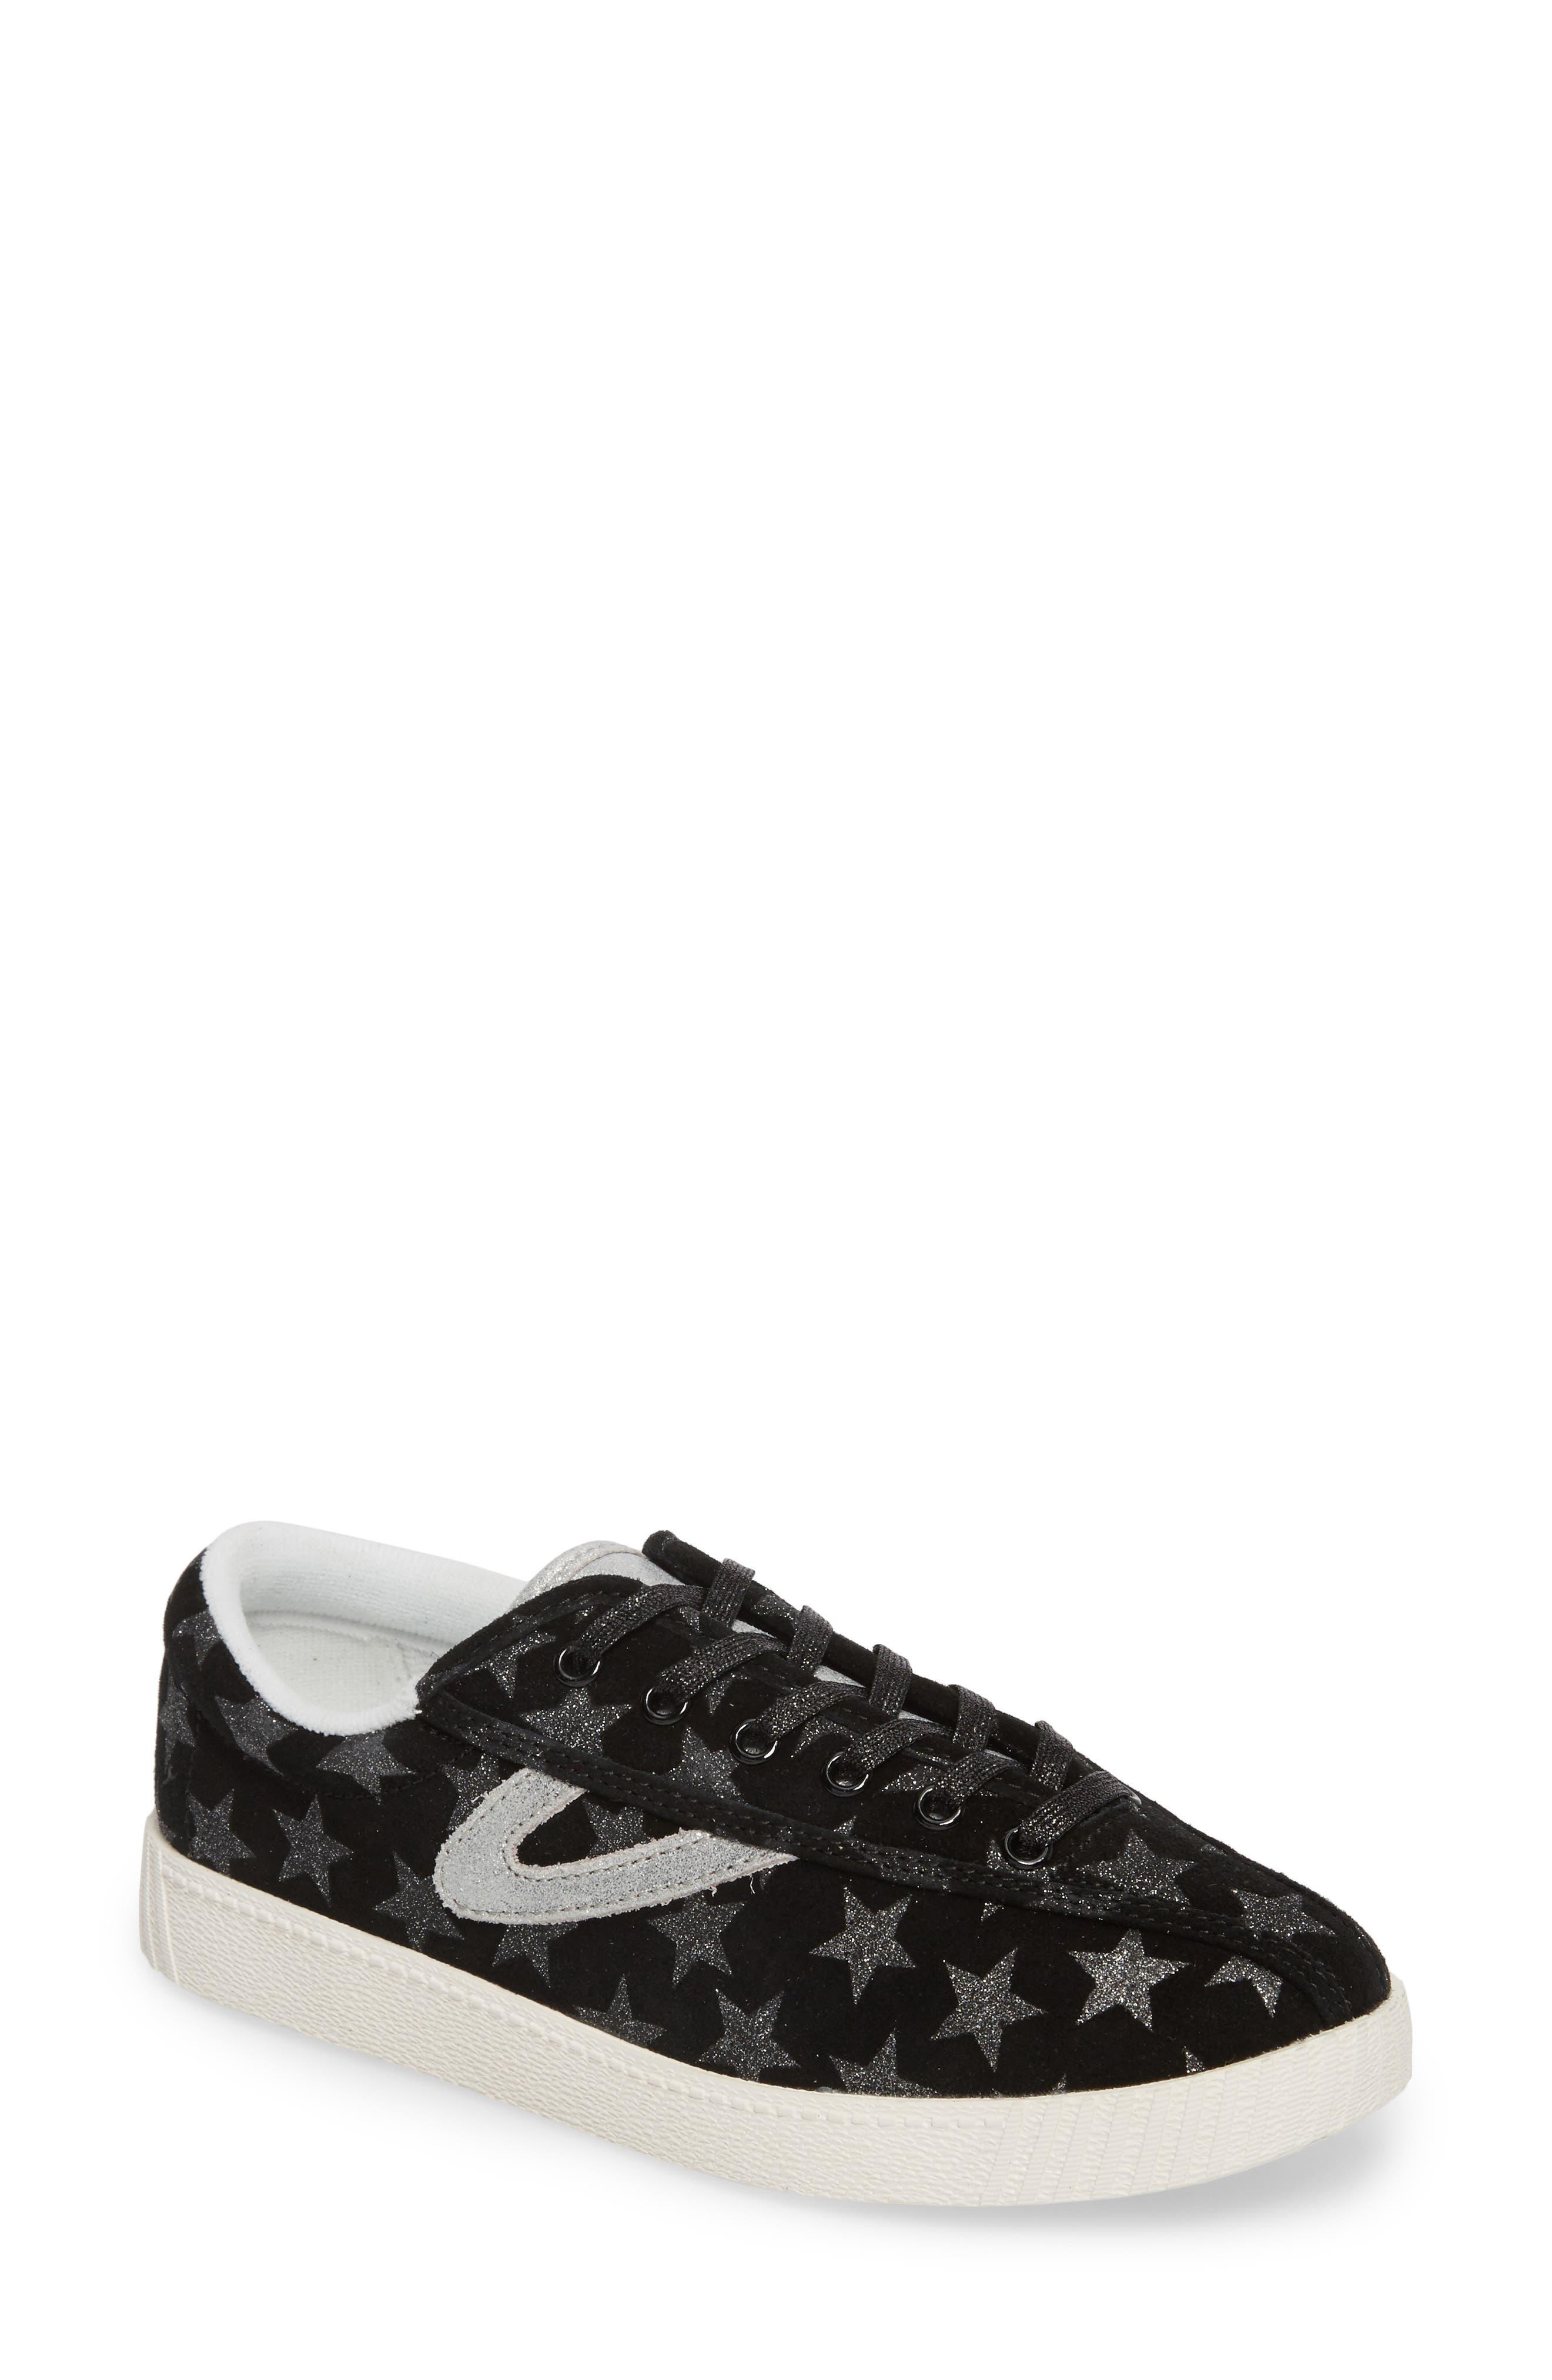 Patterned Sneaker,                             Main thumbnail 1, color,                             001